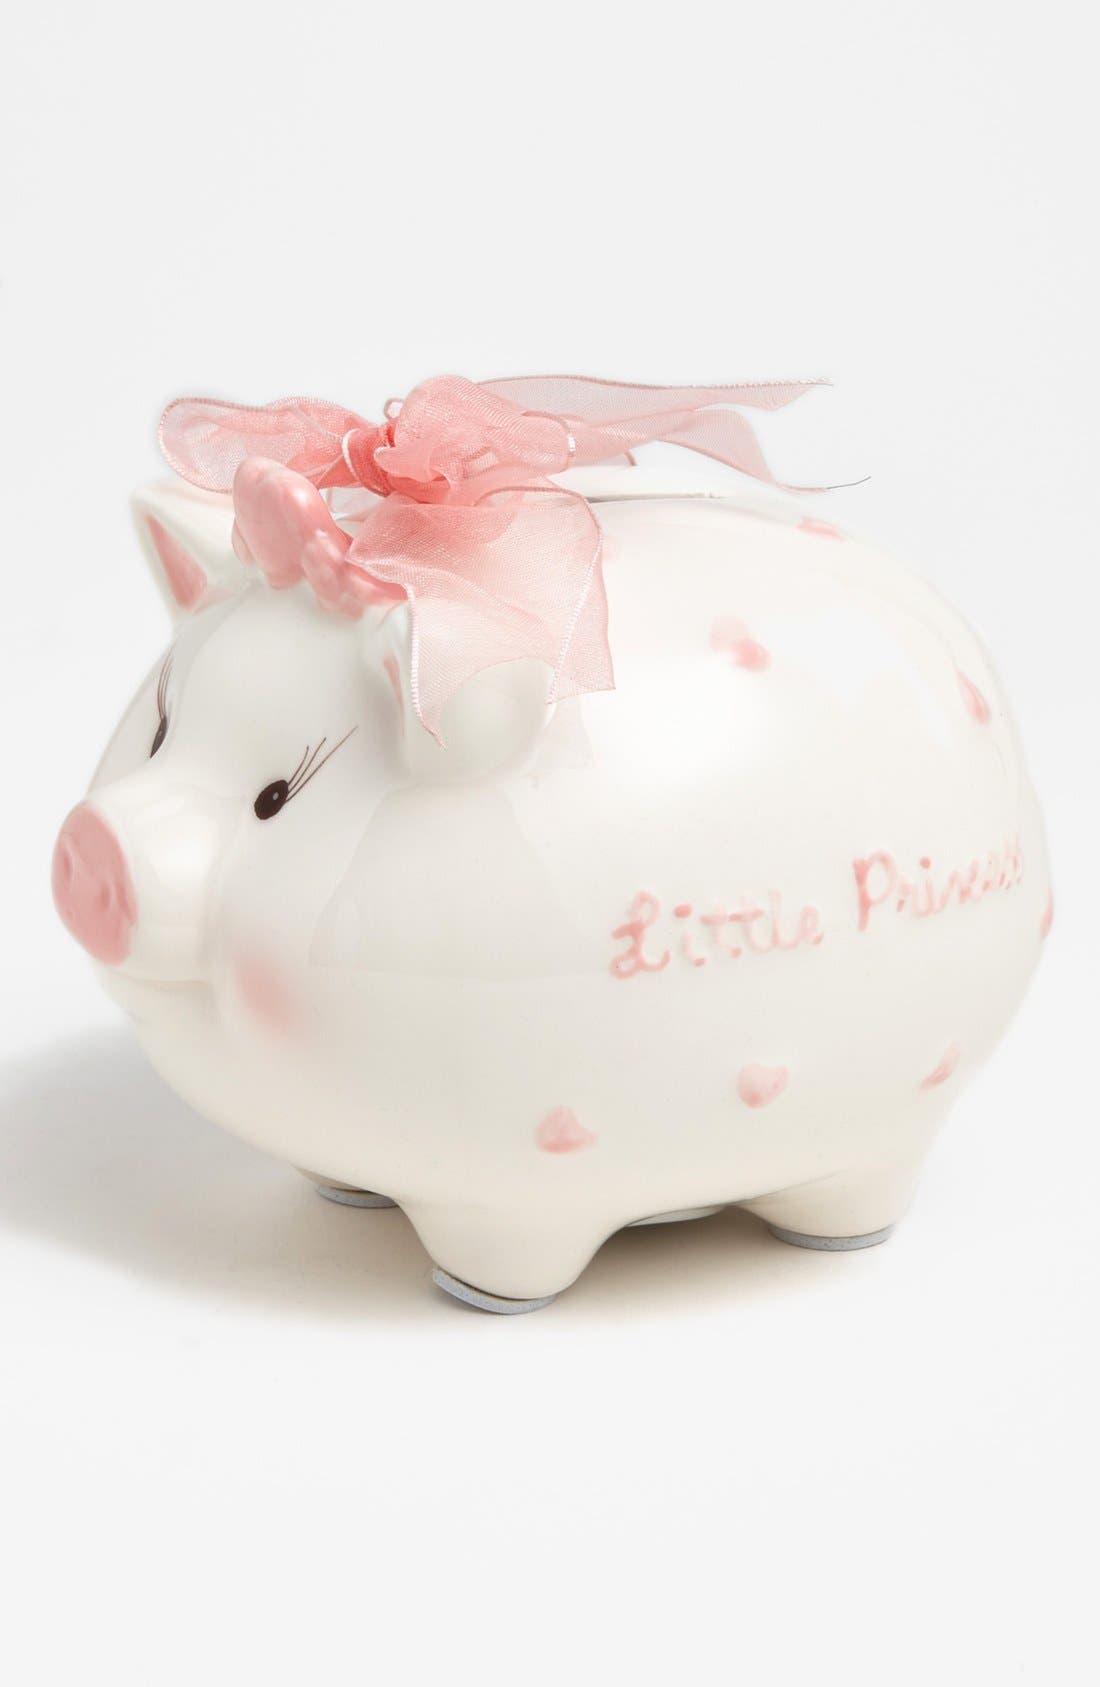 Alternate Image 1 Selected - Mud Pie 'Little Princess' Bank